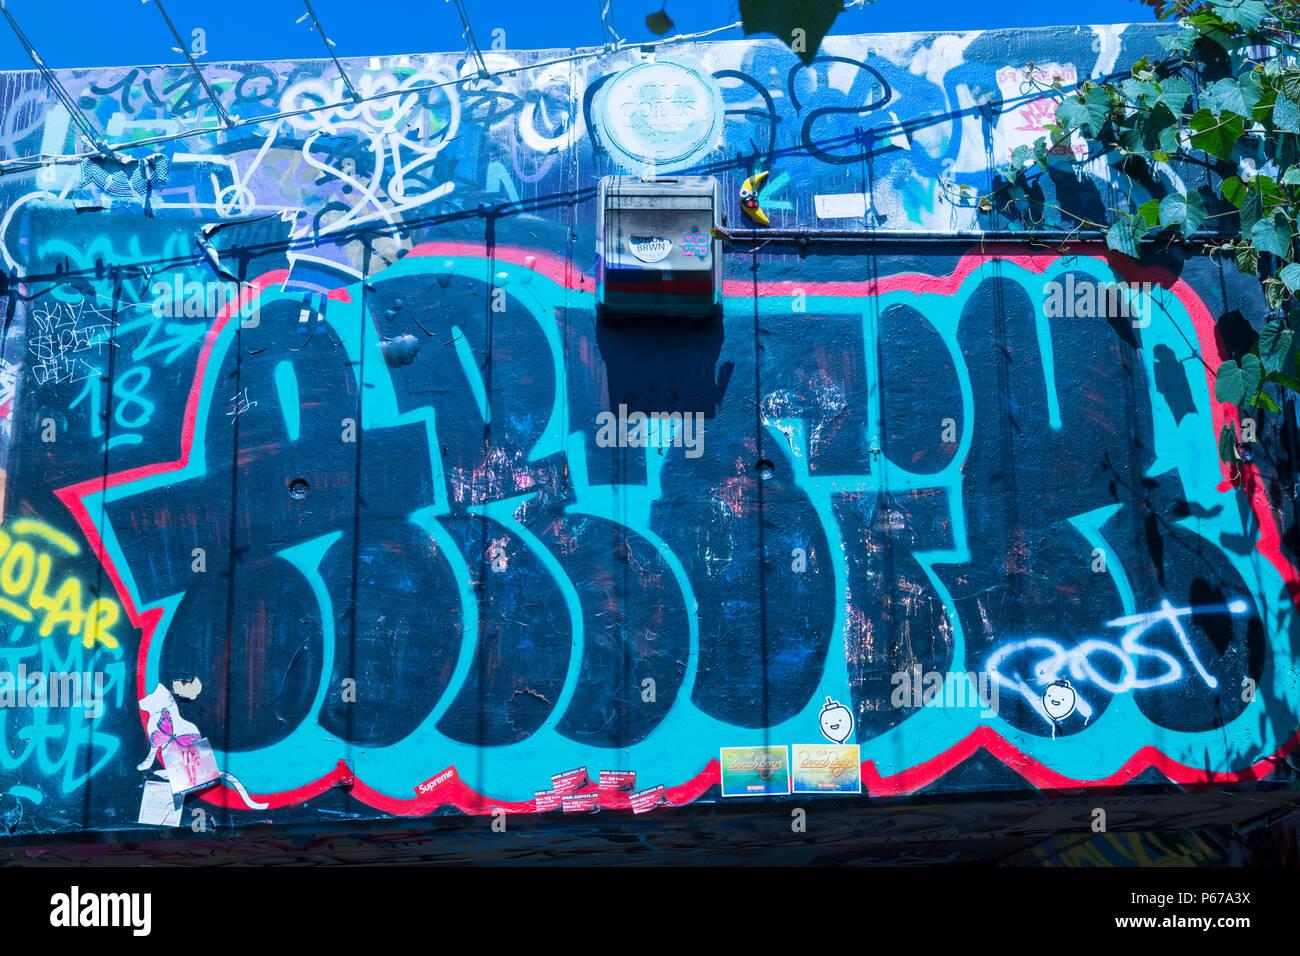 London Waterloo Leake Street graffiti light dark blue letters script wall pavement sidewalk detail Arthur blue sky leaves - Stock Image